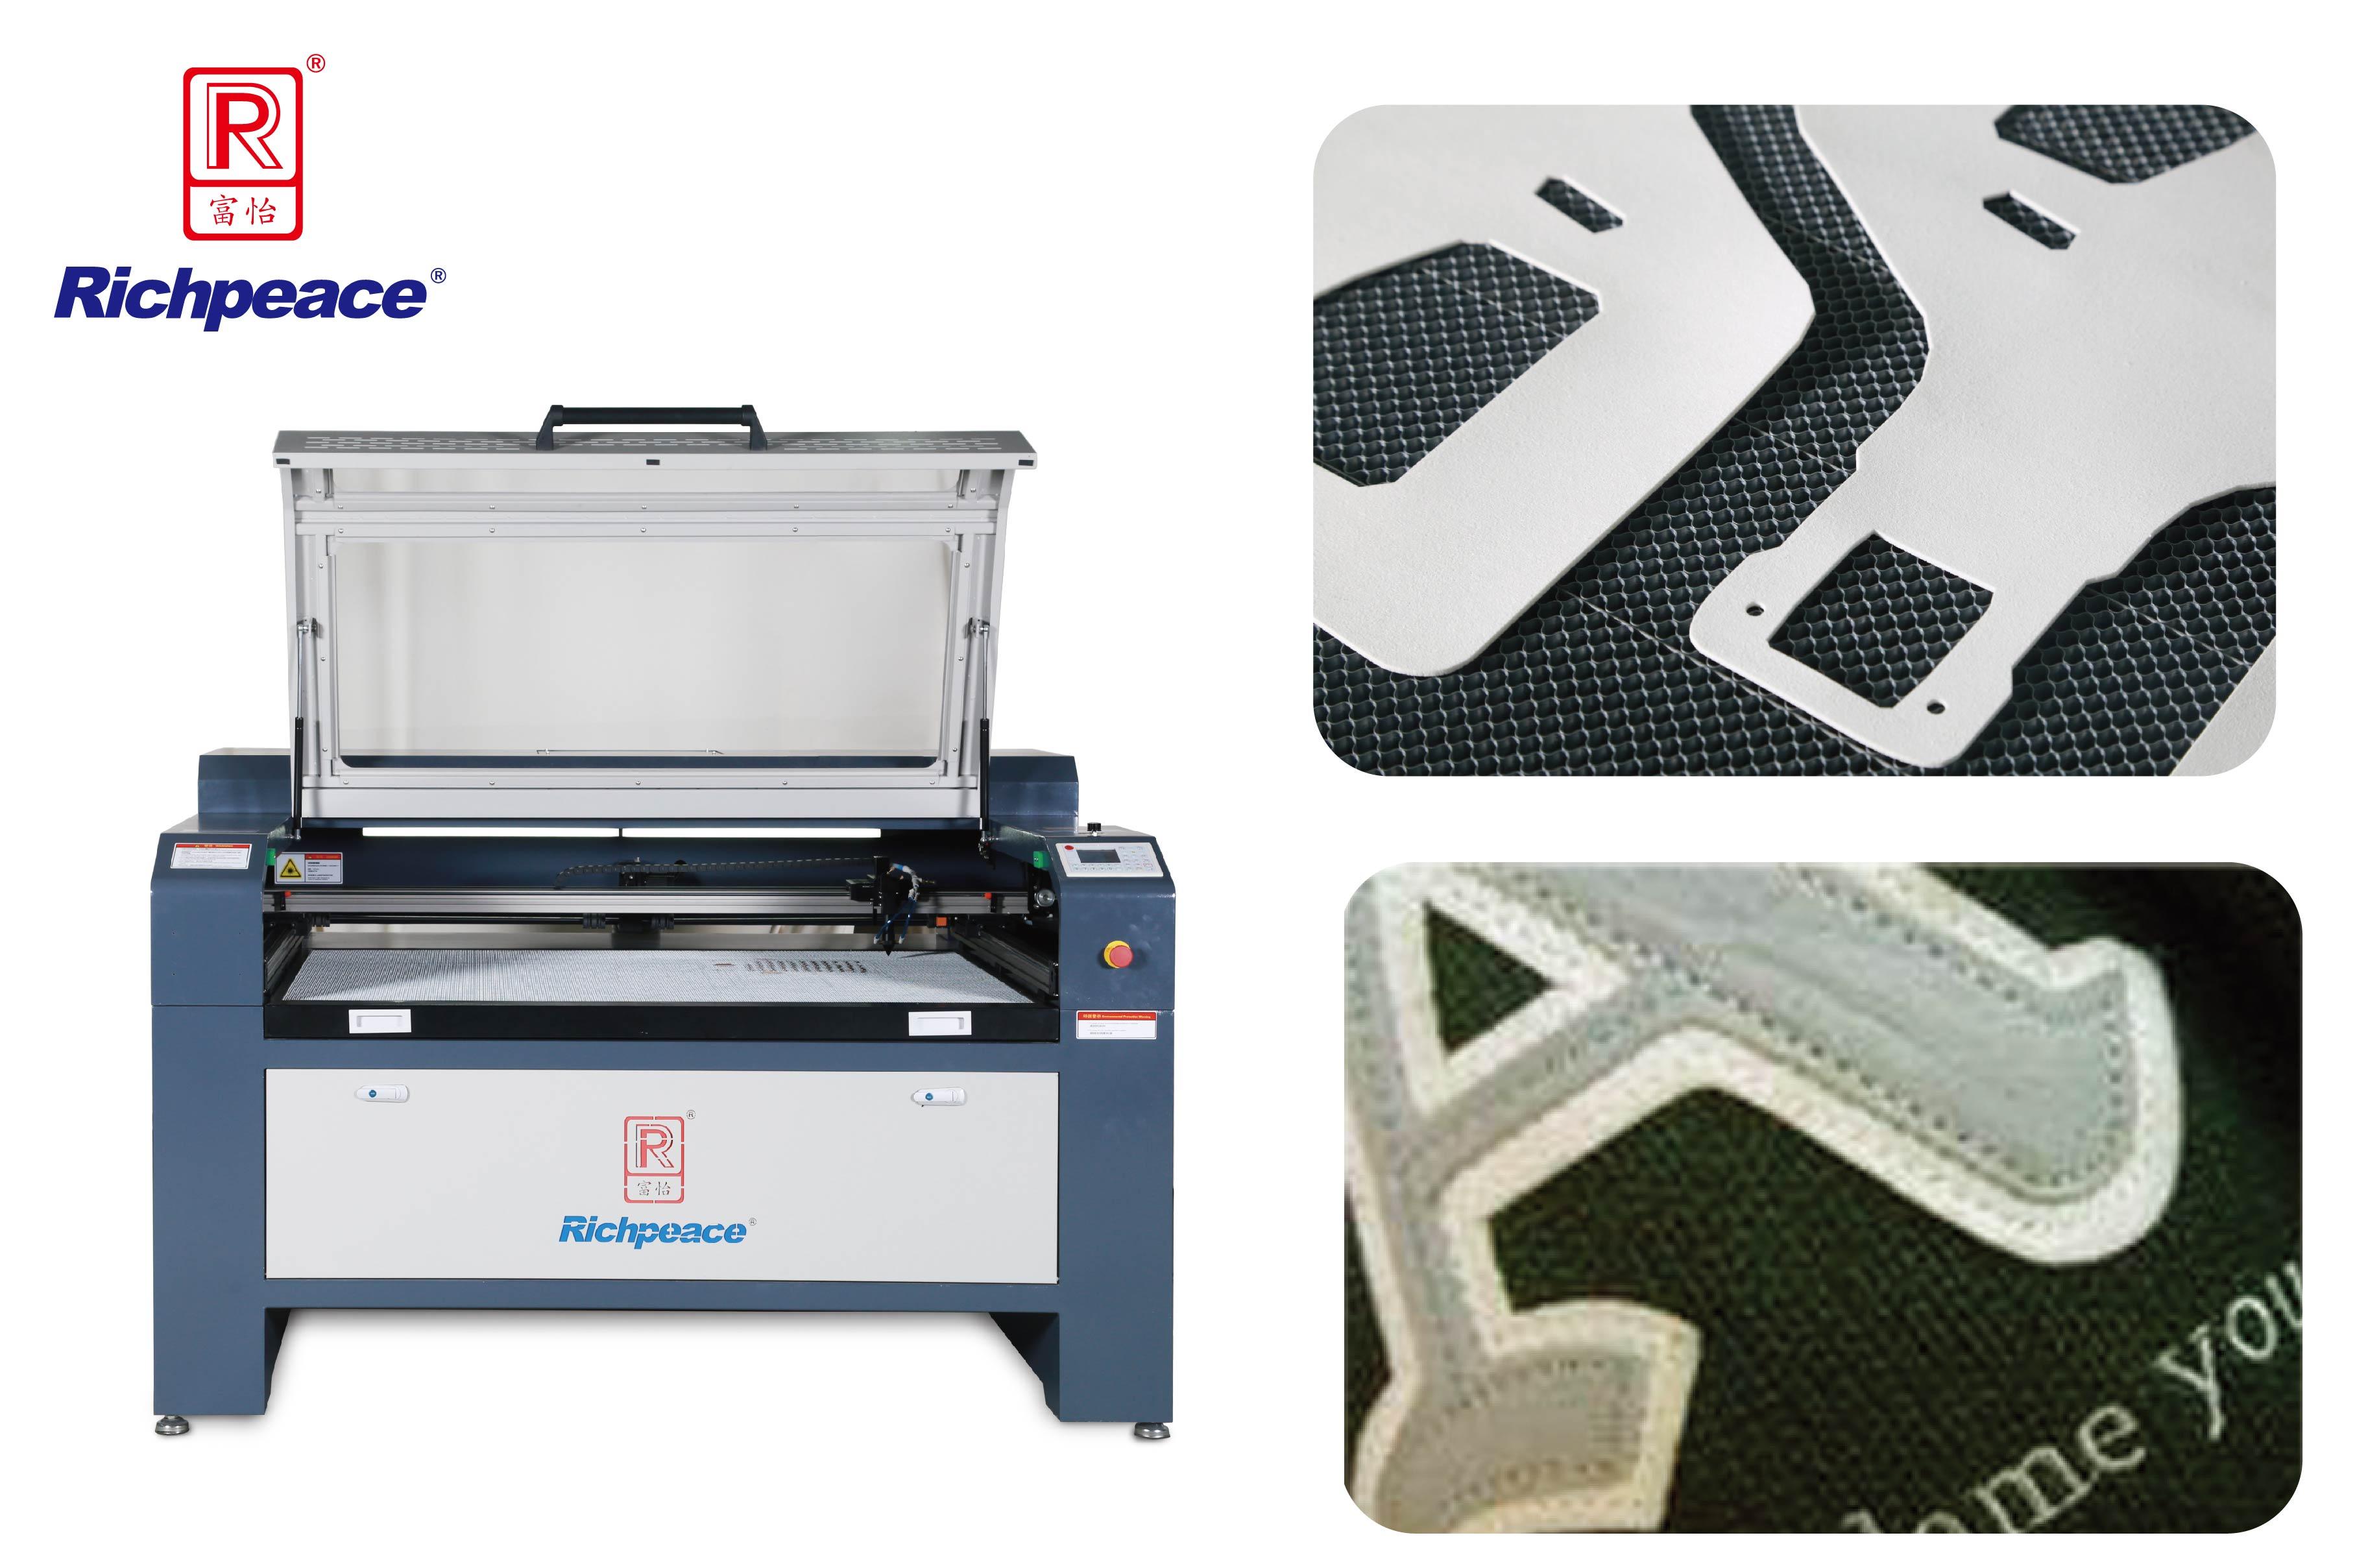 Richpeace Laser Engraving Cutting machine